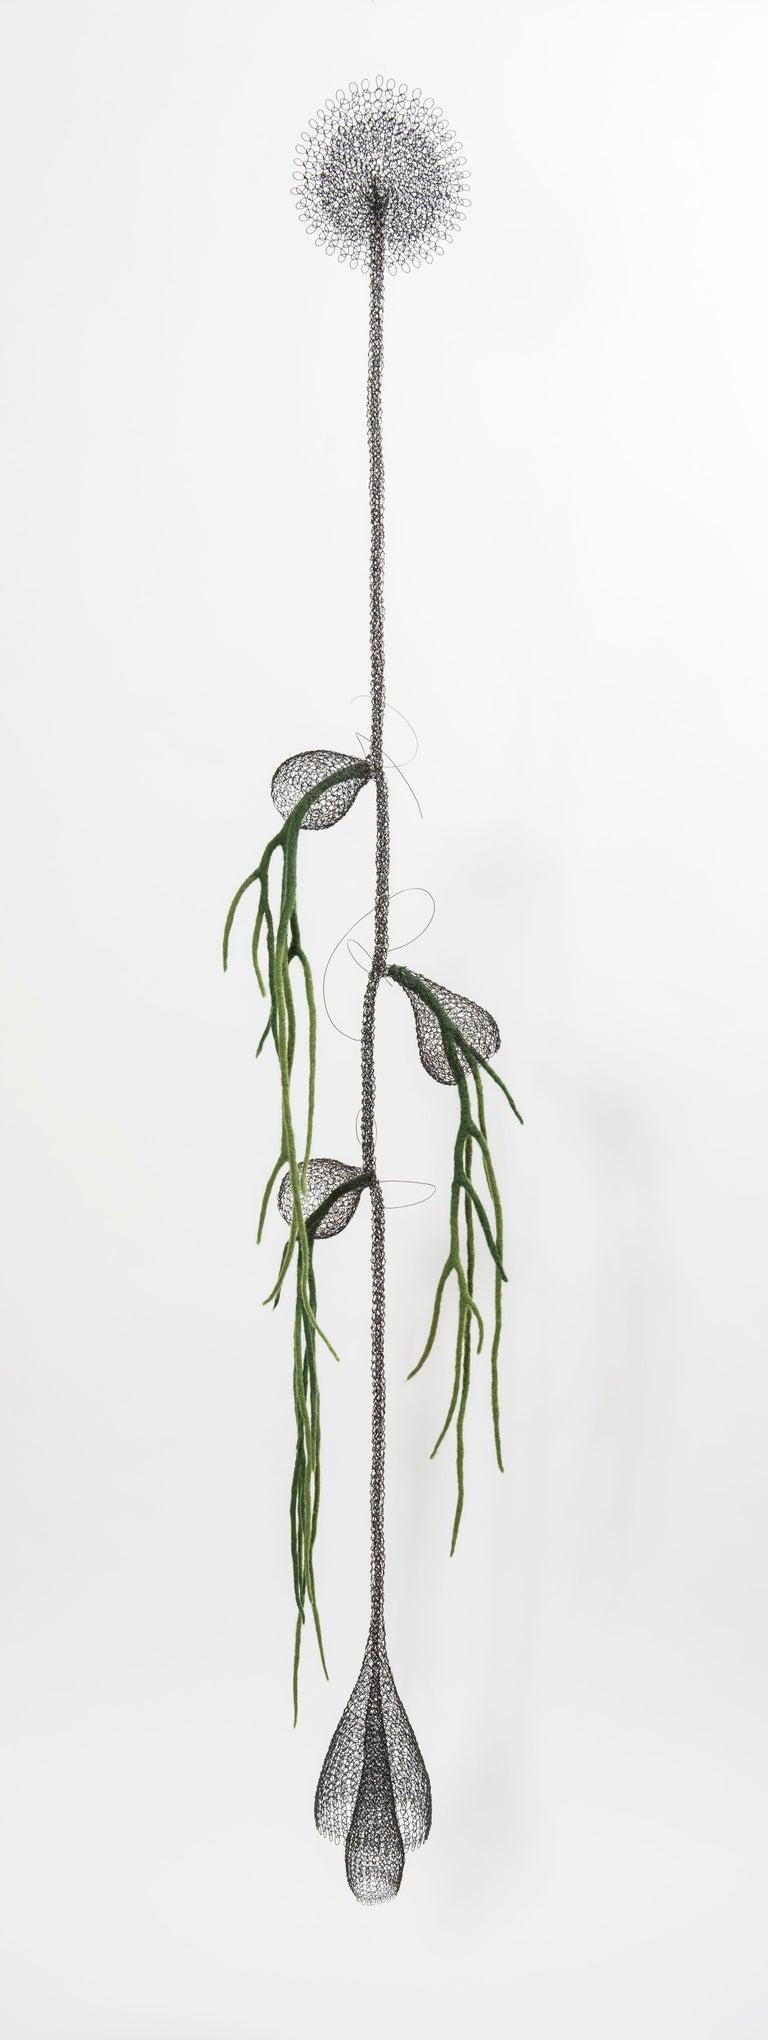 Delphine Grandvaux Abstract Sculpture - «Liane I», Handmade Metal Wire Mesh and Green Wool Pendant Mural Sculpture